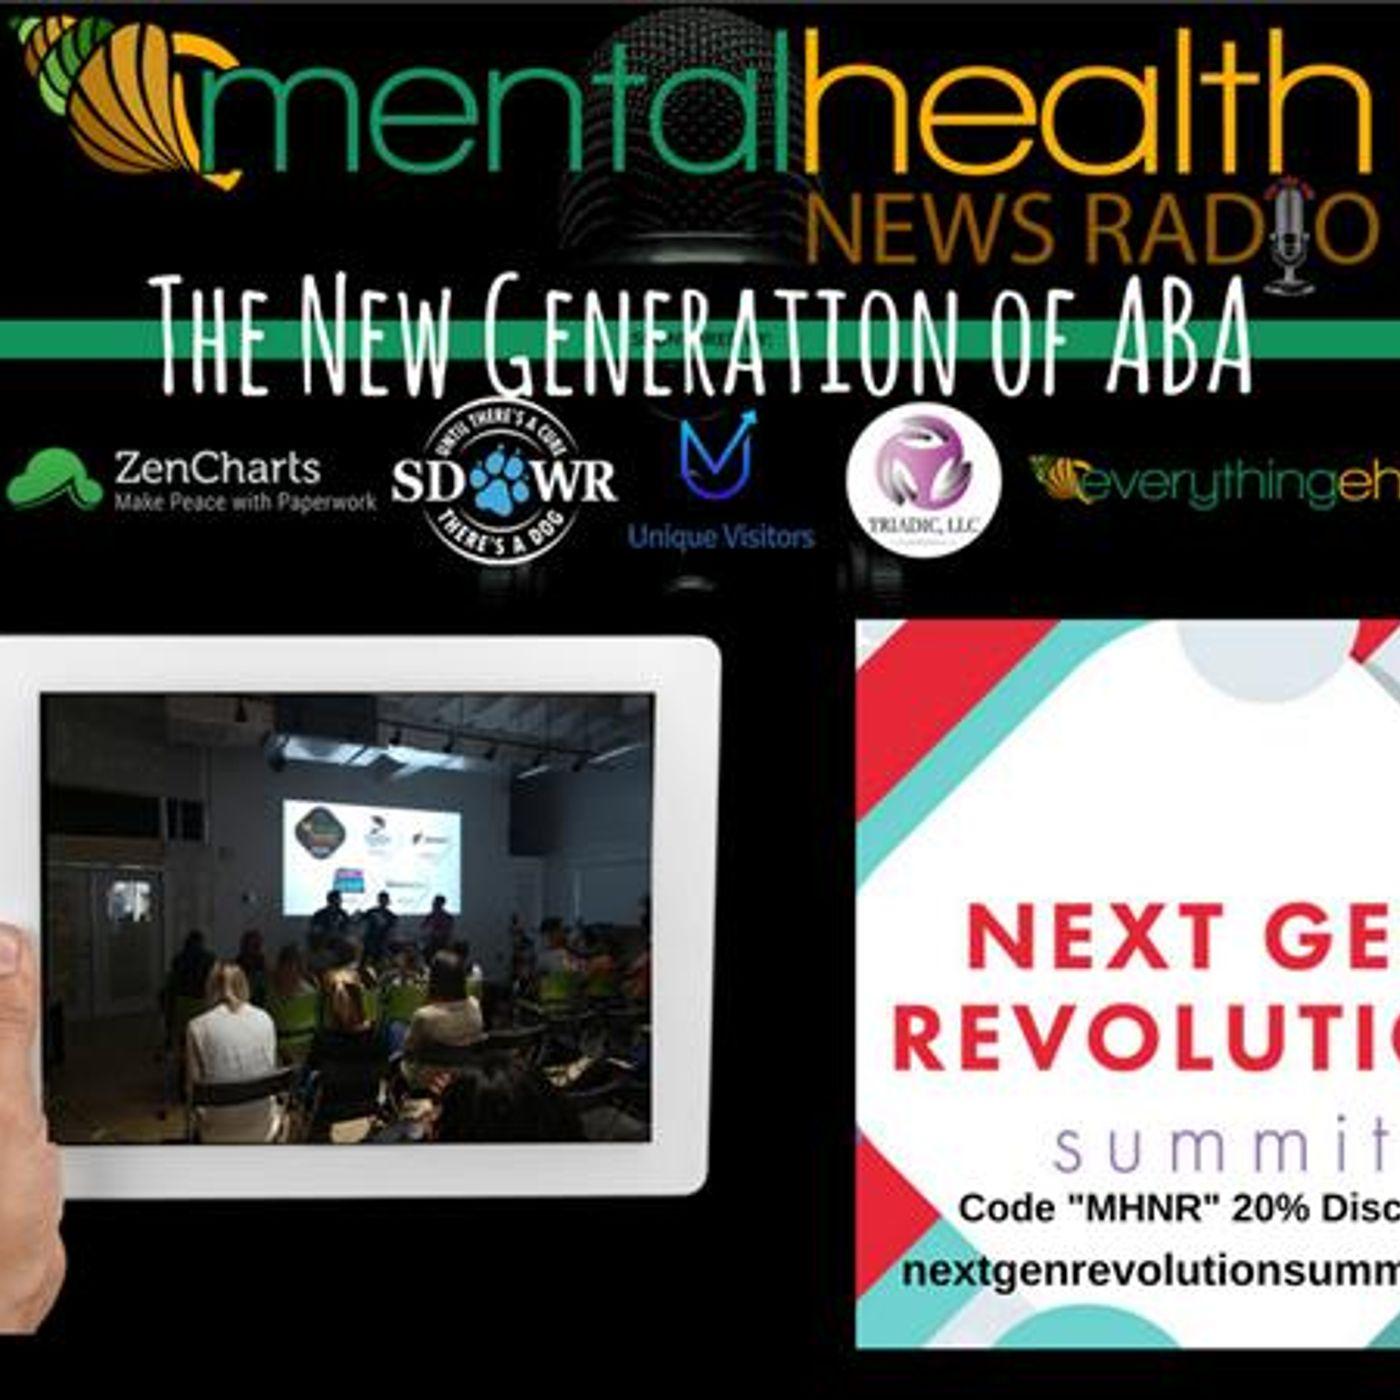 Mental Health News Radio - The New Generation of ABA: Alice Ynirro at Next Gen Revolution Summit